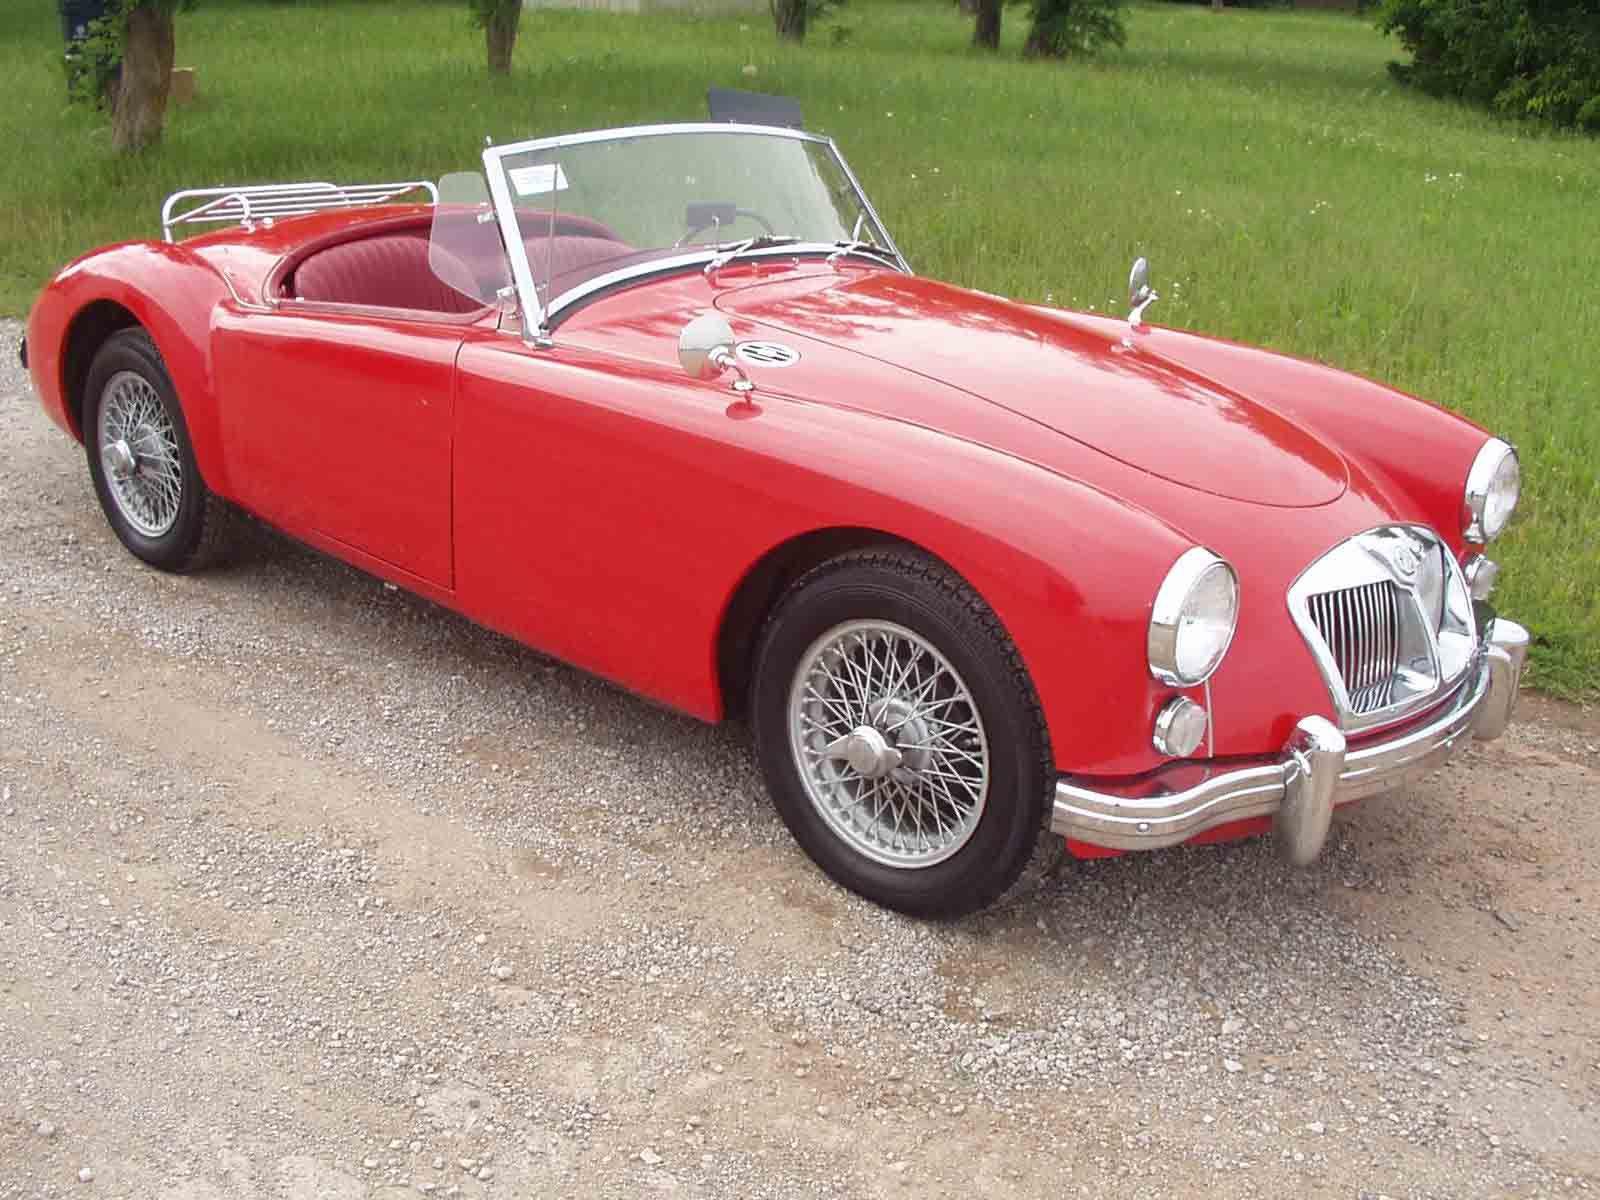 1962 MGA 1600 MK II Vintage cars, Classic cars, Cars